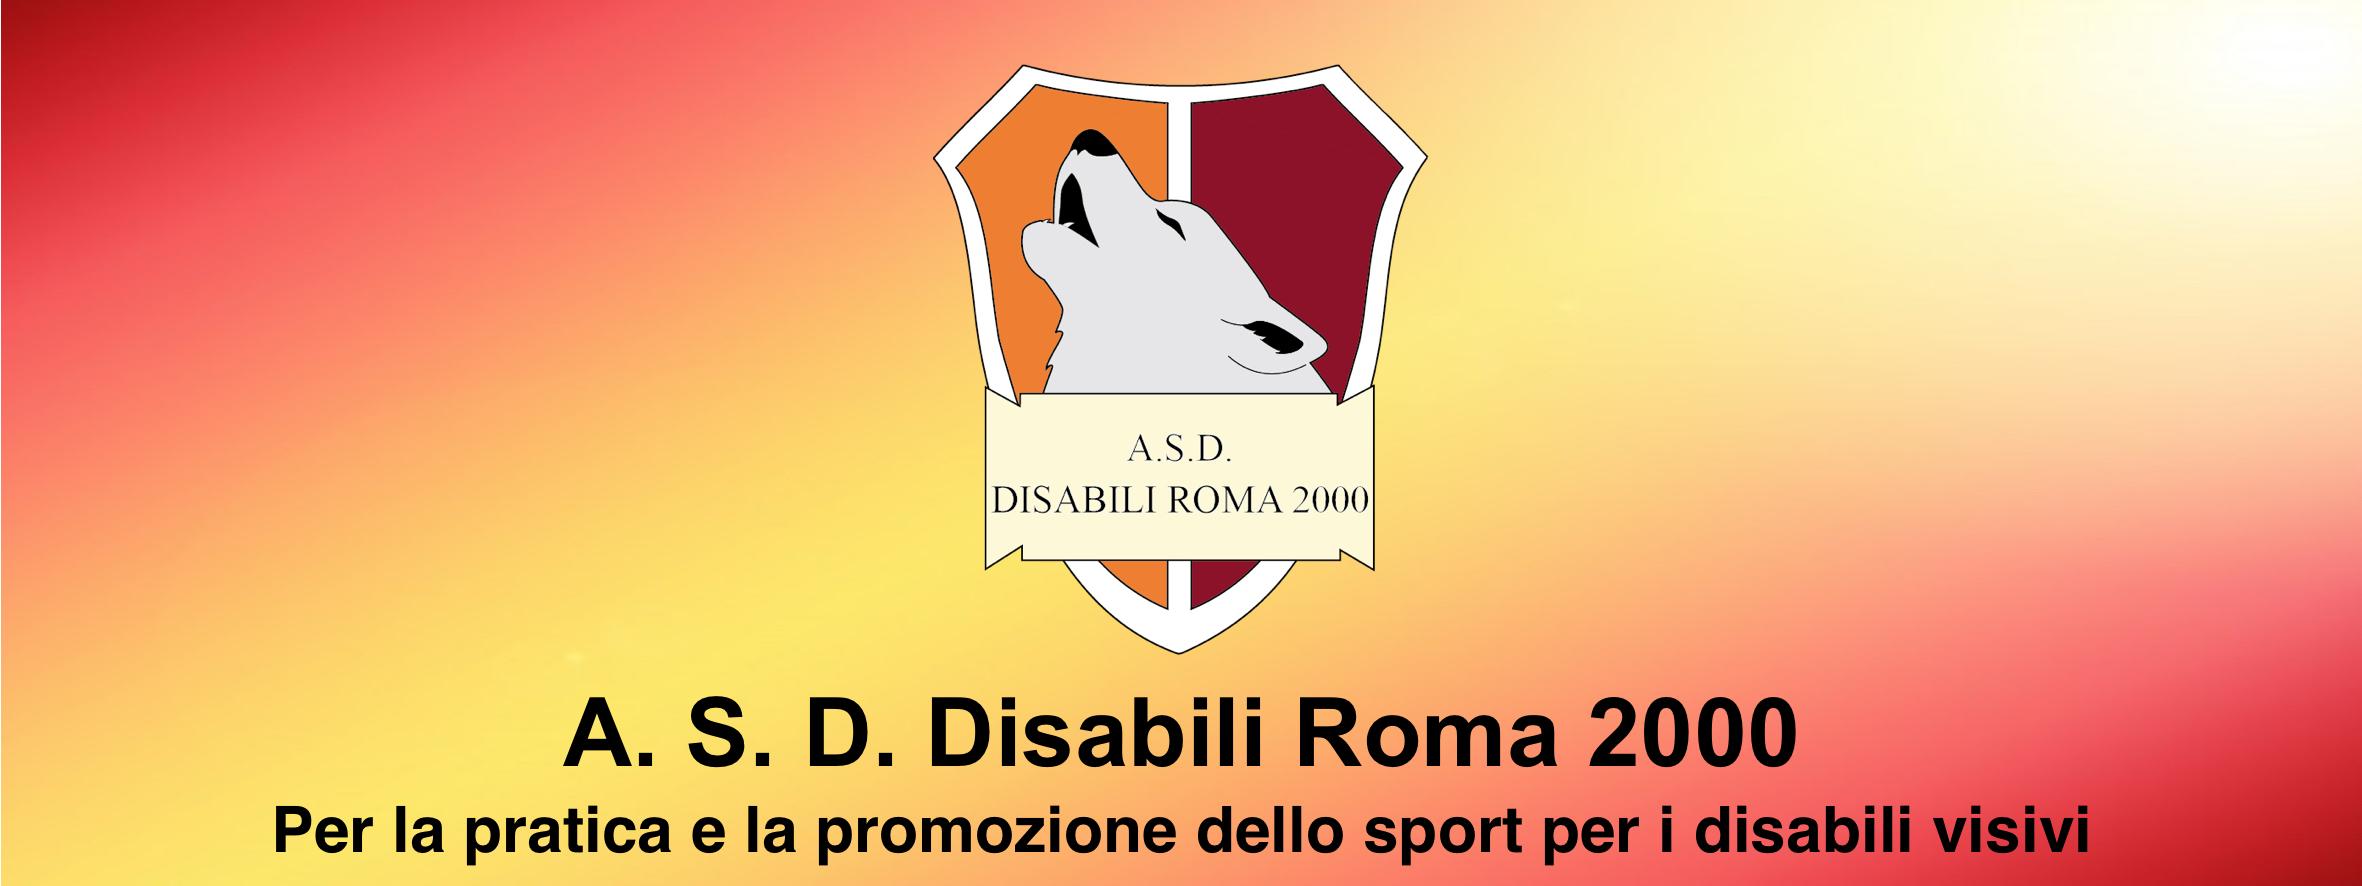 ASD Disabili Roma 2000